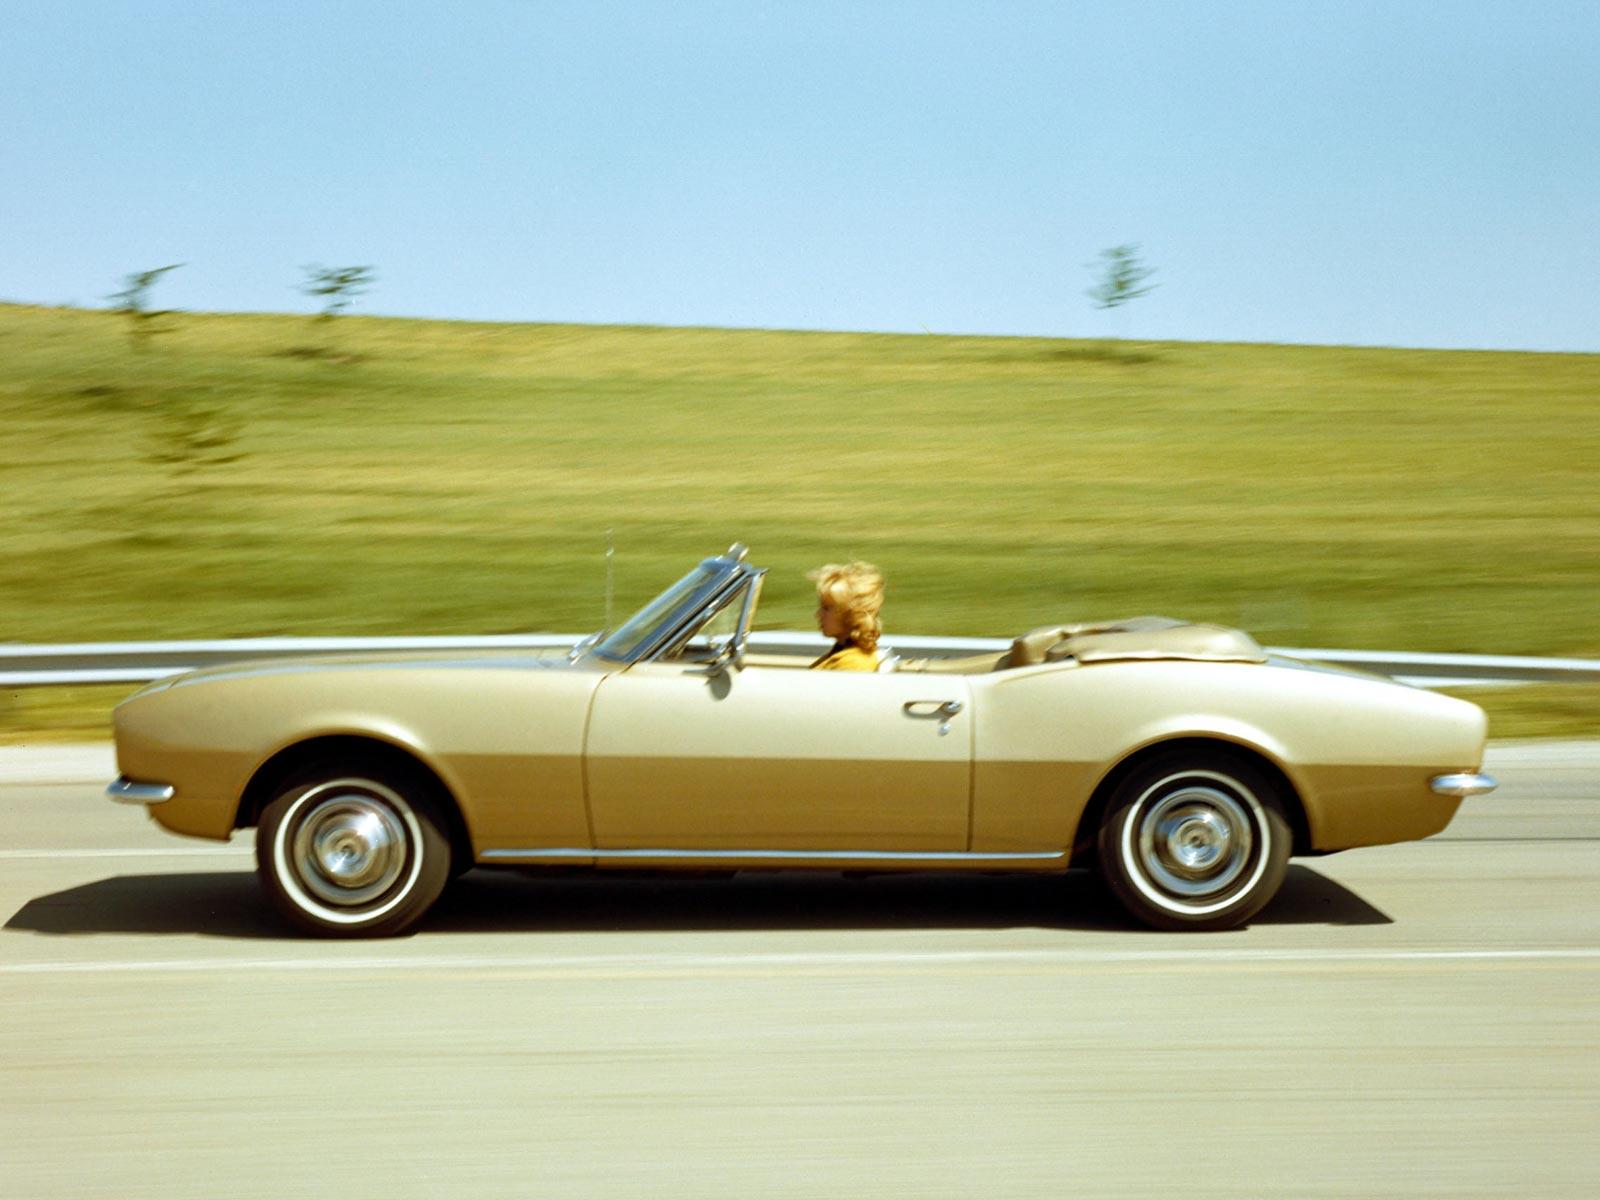 1966 1969 chevrolet camaro cabrio autoguru. Black Bedroom Furniture Sets. Home Design Ideas